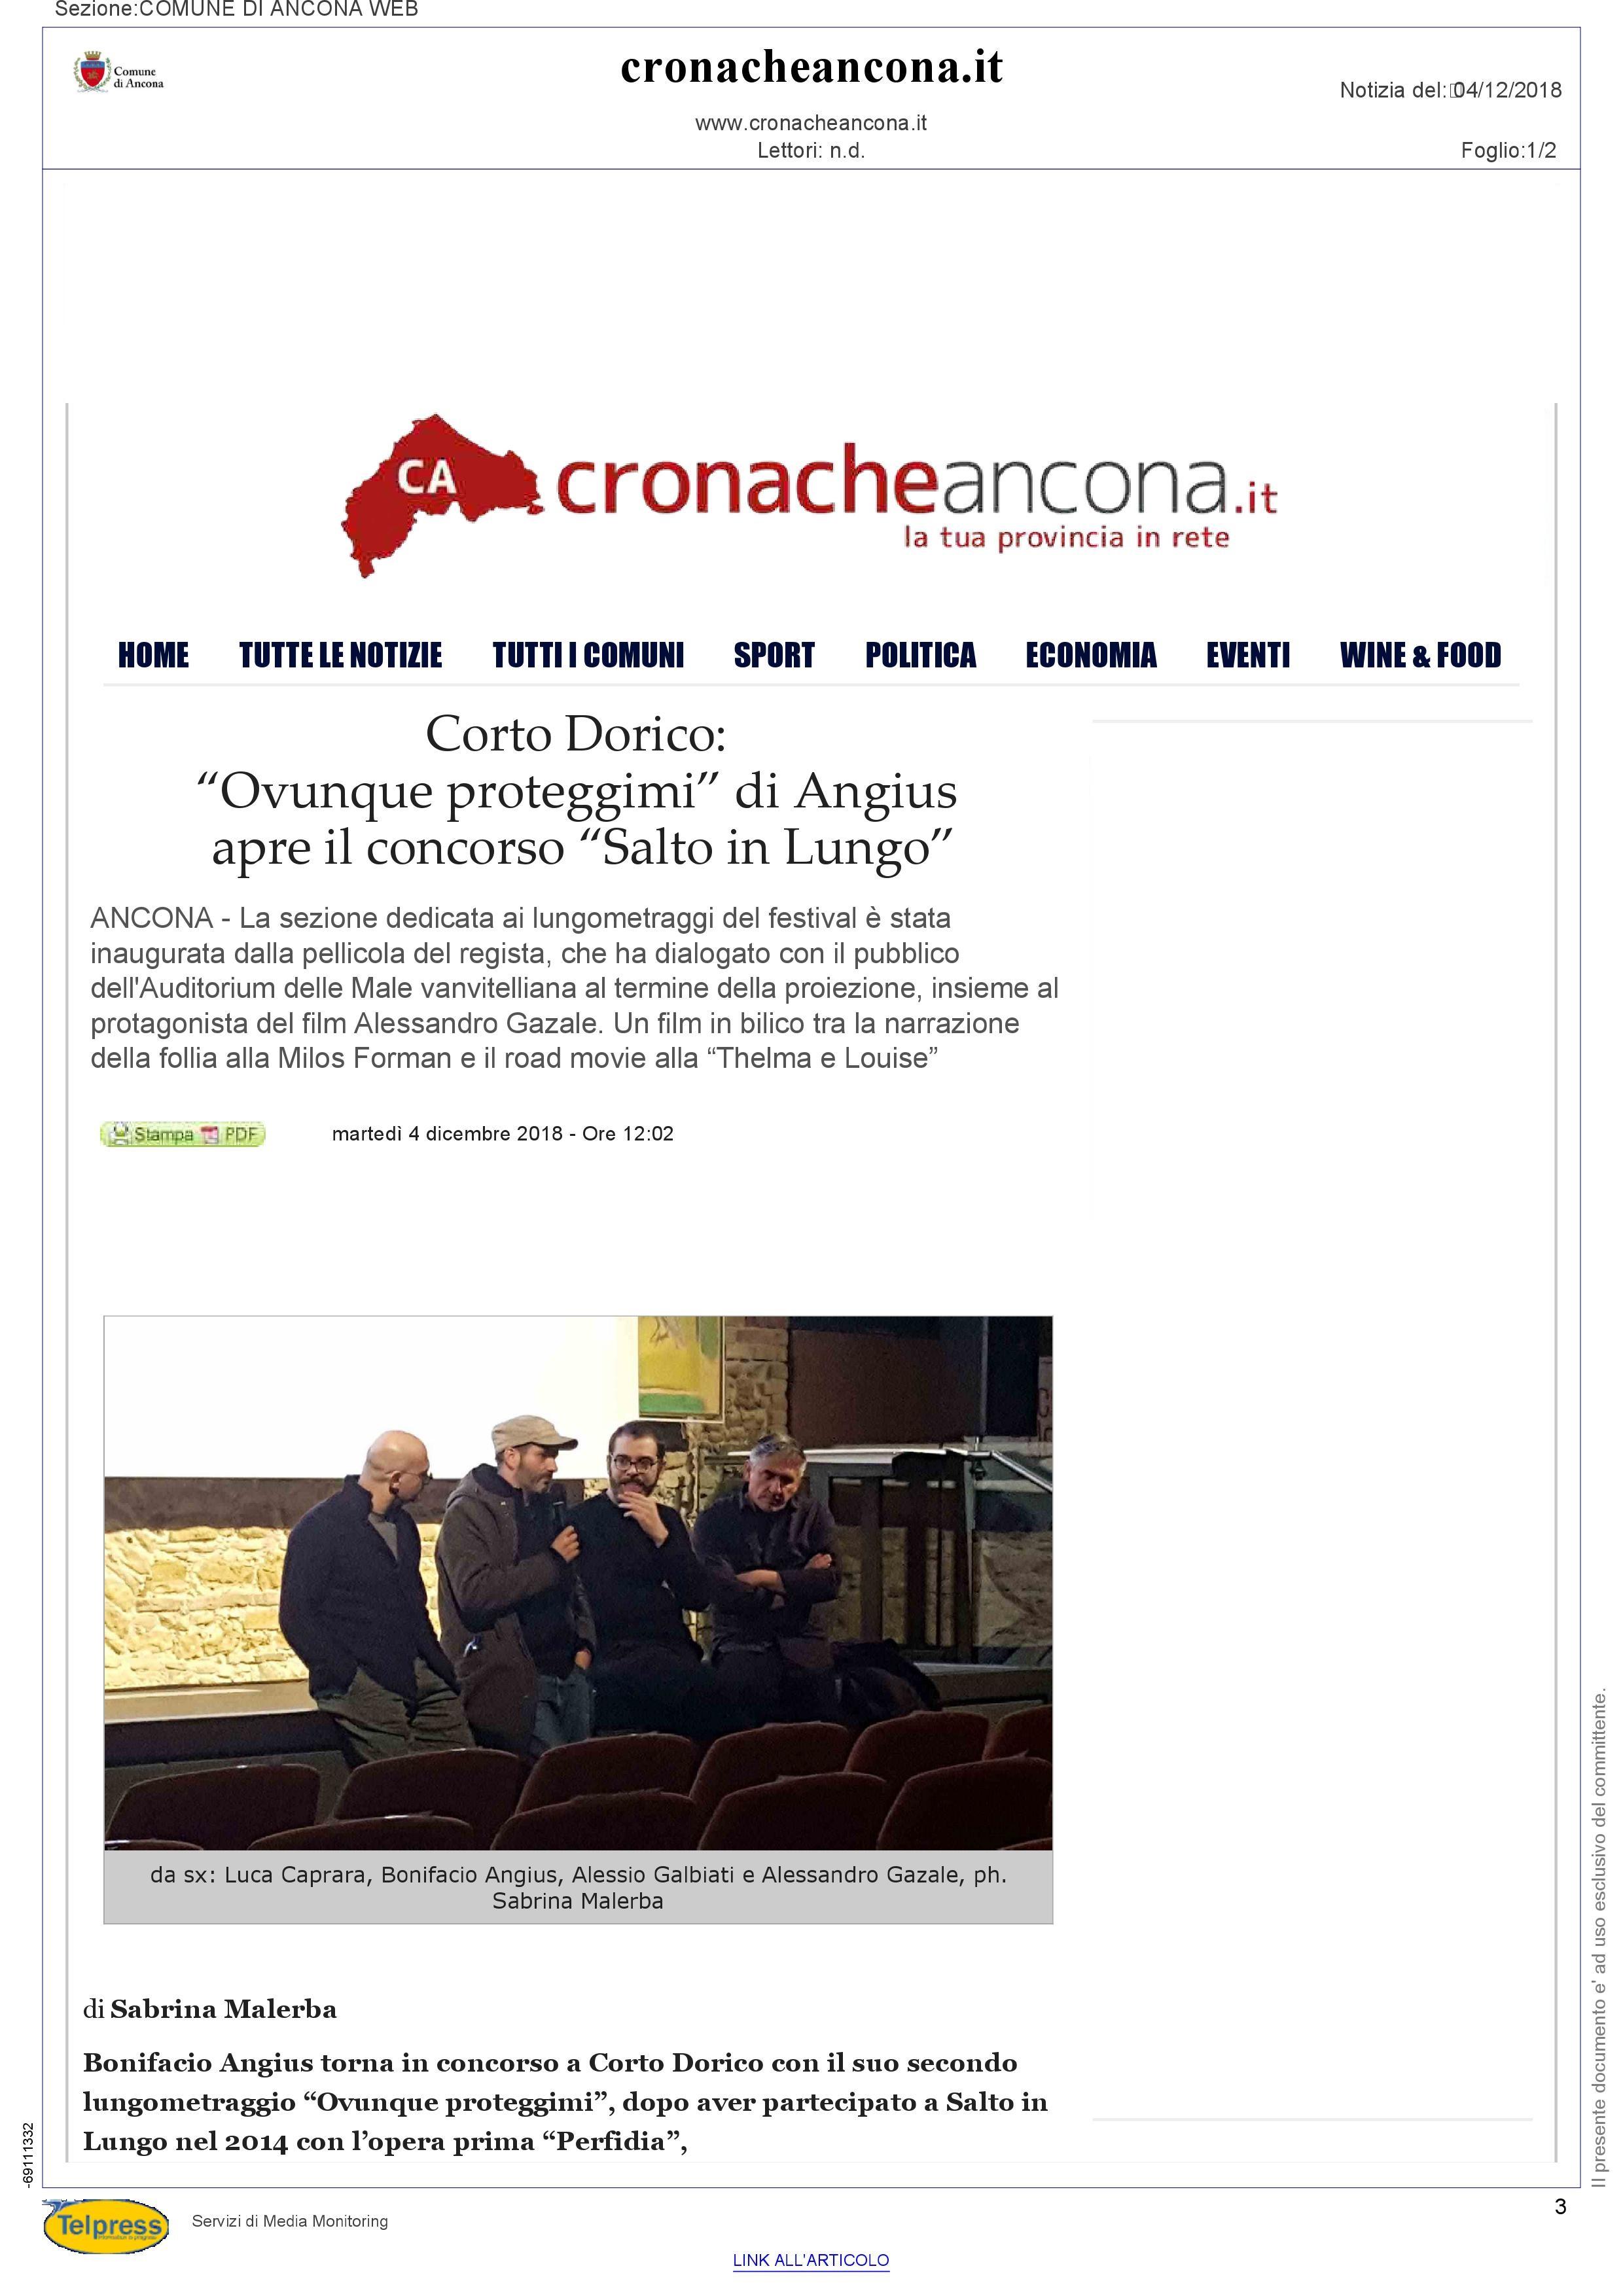 4-12-18 Cronache Ancona pag 1